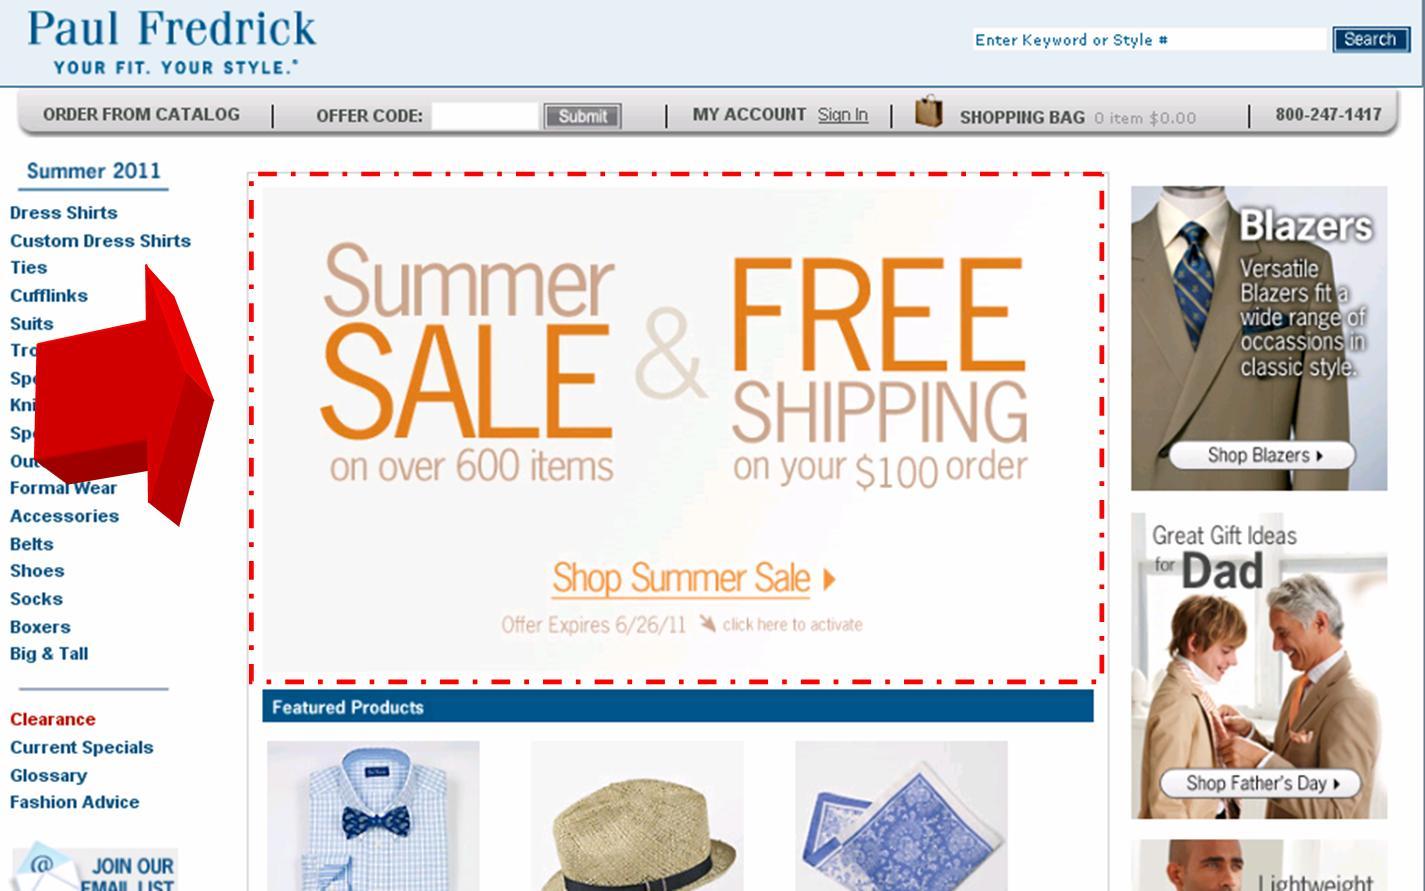 Paul fredrick discount coupons